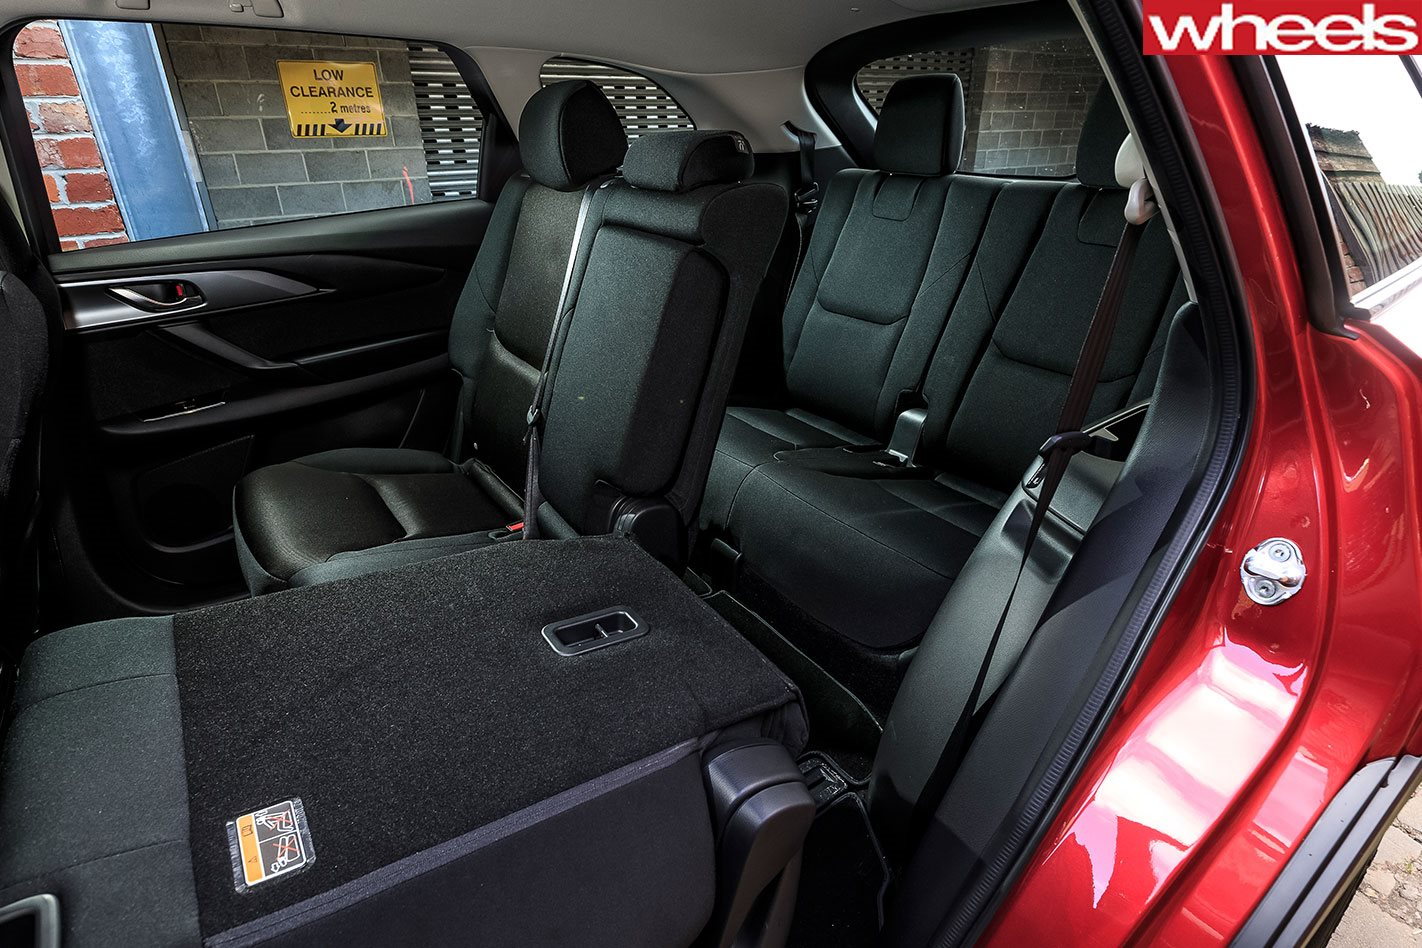 Miraculous Mazda Cx 9 2019 Review Price Features Australia Creativecarmelina Interior Chair Design Creativecarmelinacom